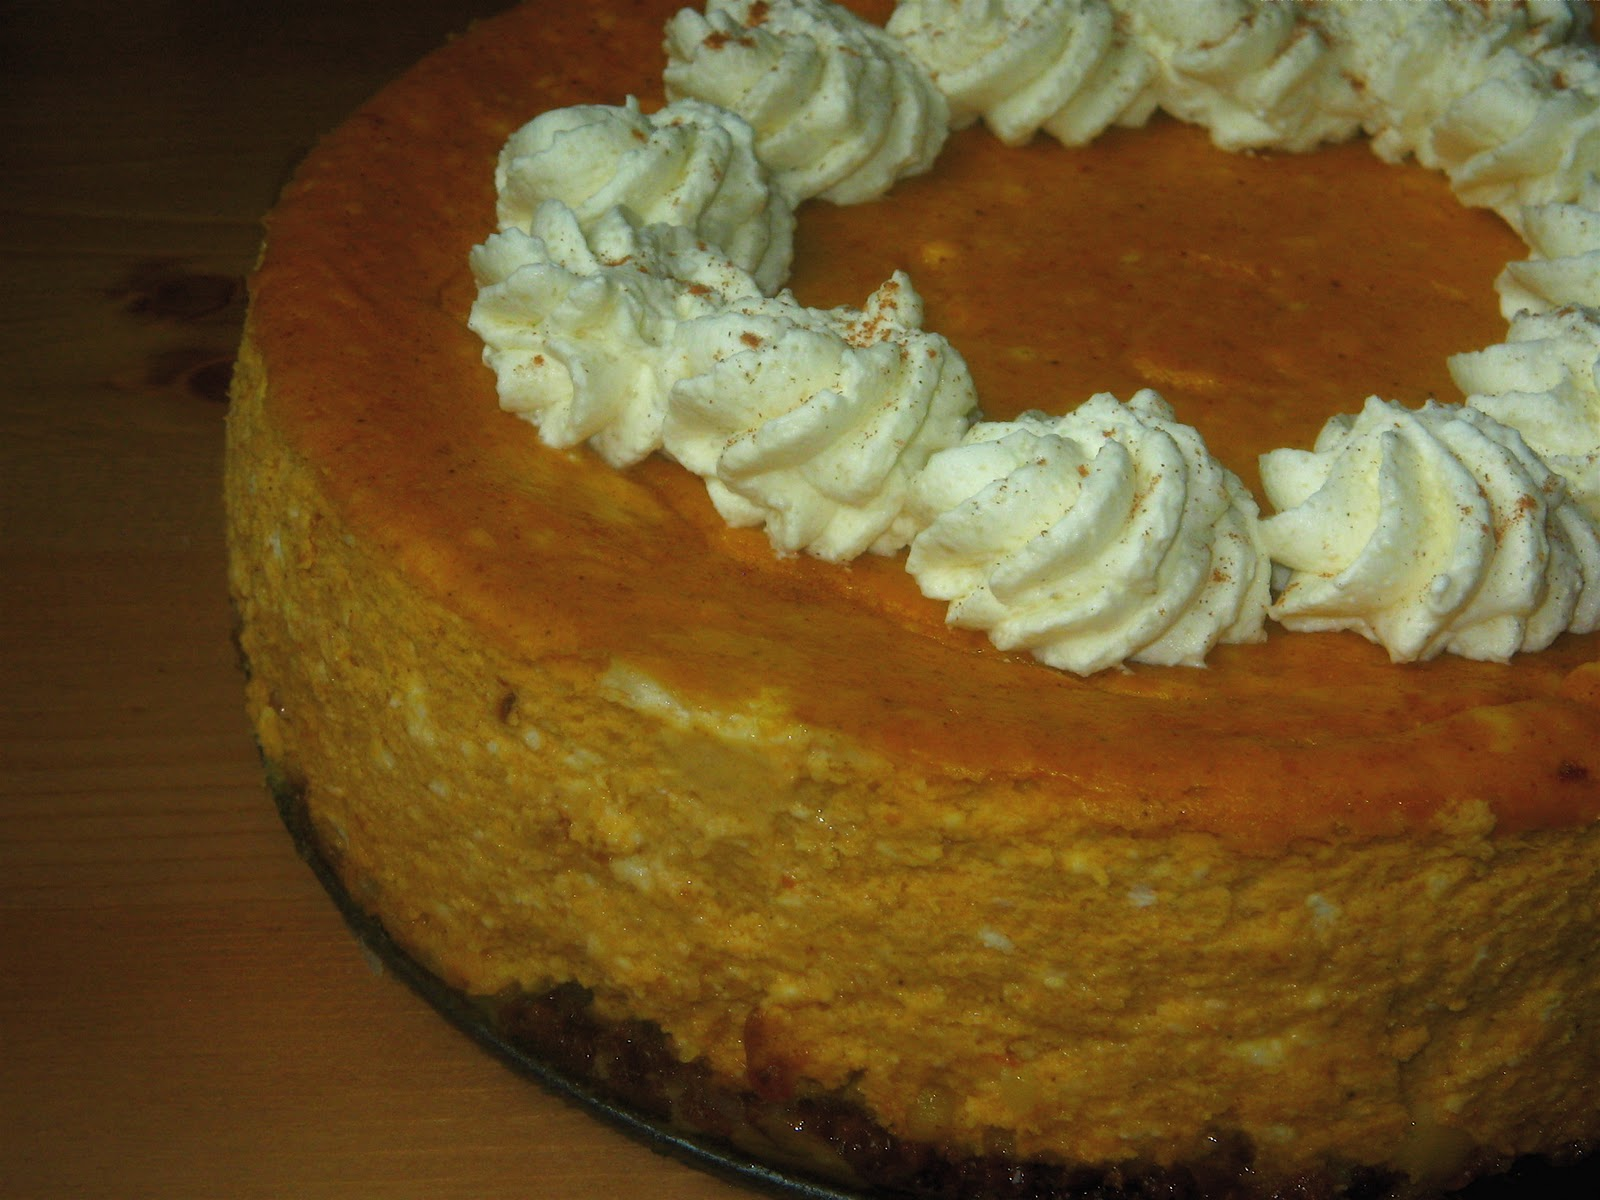 A Full Life: Pumpkin Cheesecake: The New Pumpkin Pie